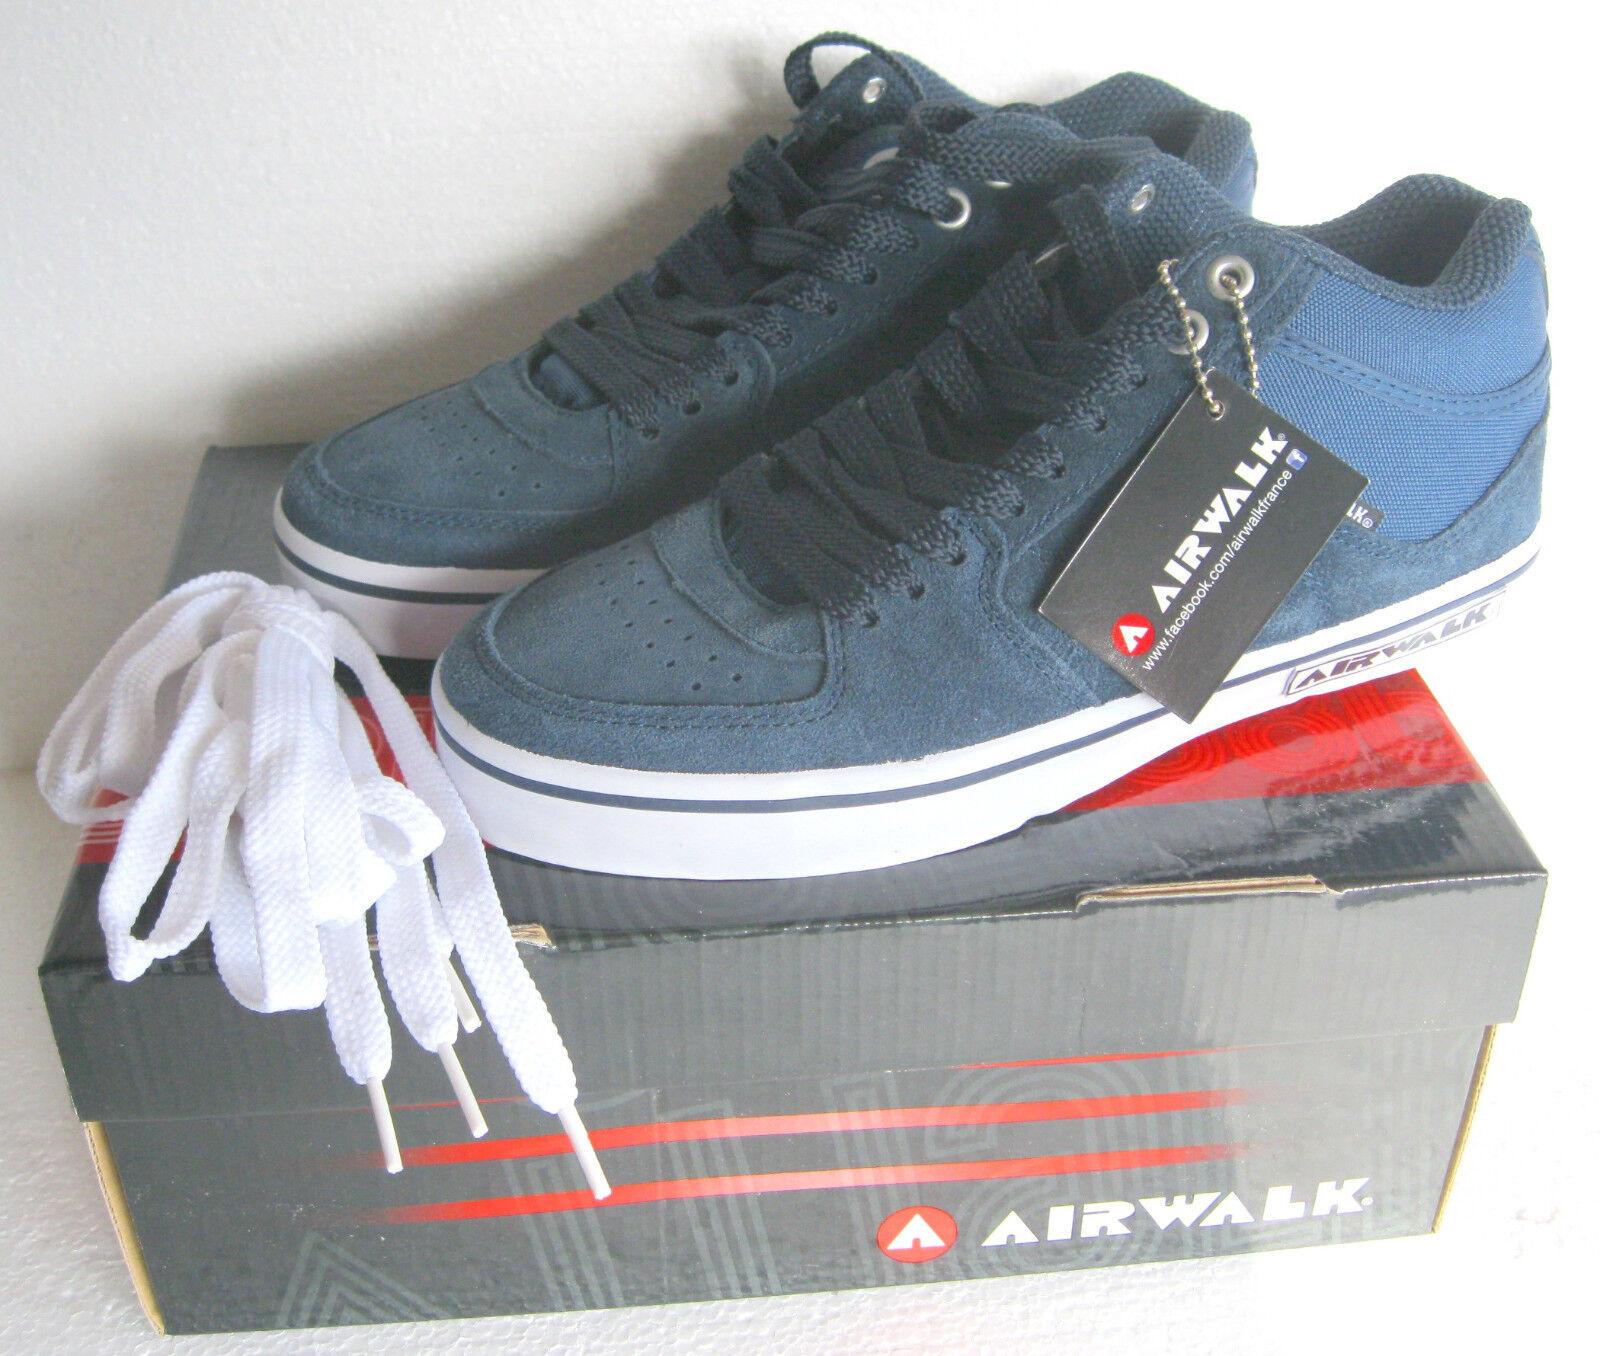 AIRWALK Burn Etnik 180310-4110 scarpe da ginnastica Eur Dimensione  39 - NUOVE, BRAND NEW